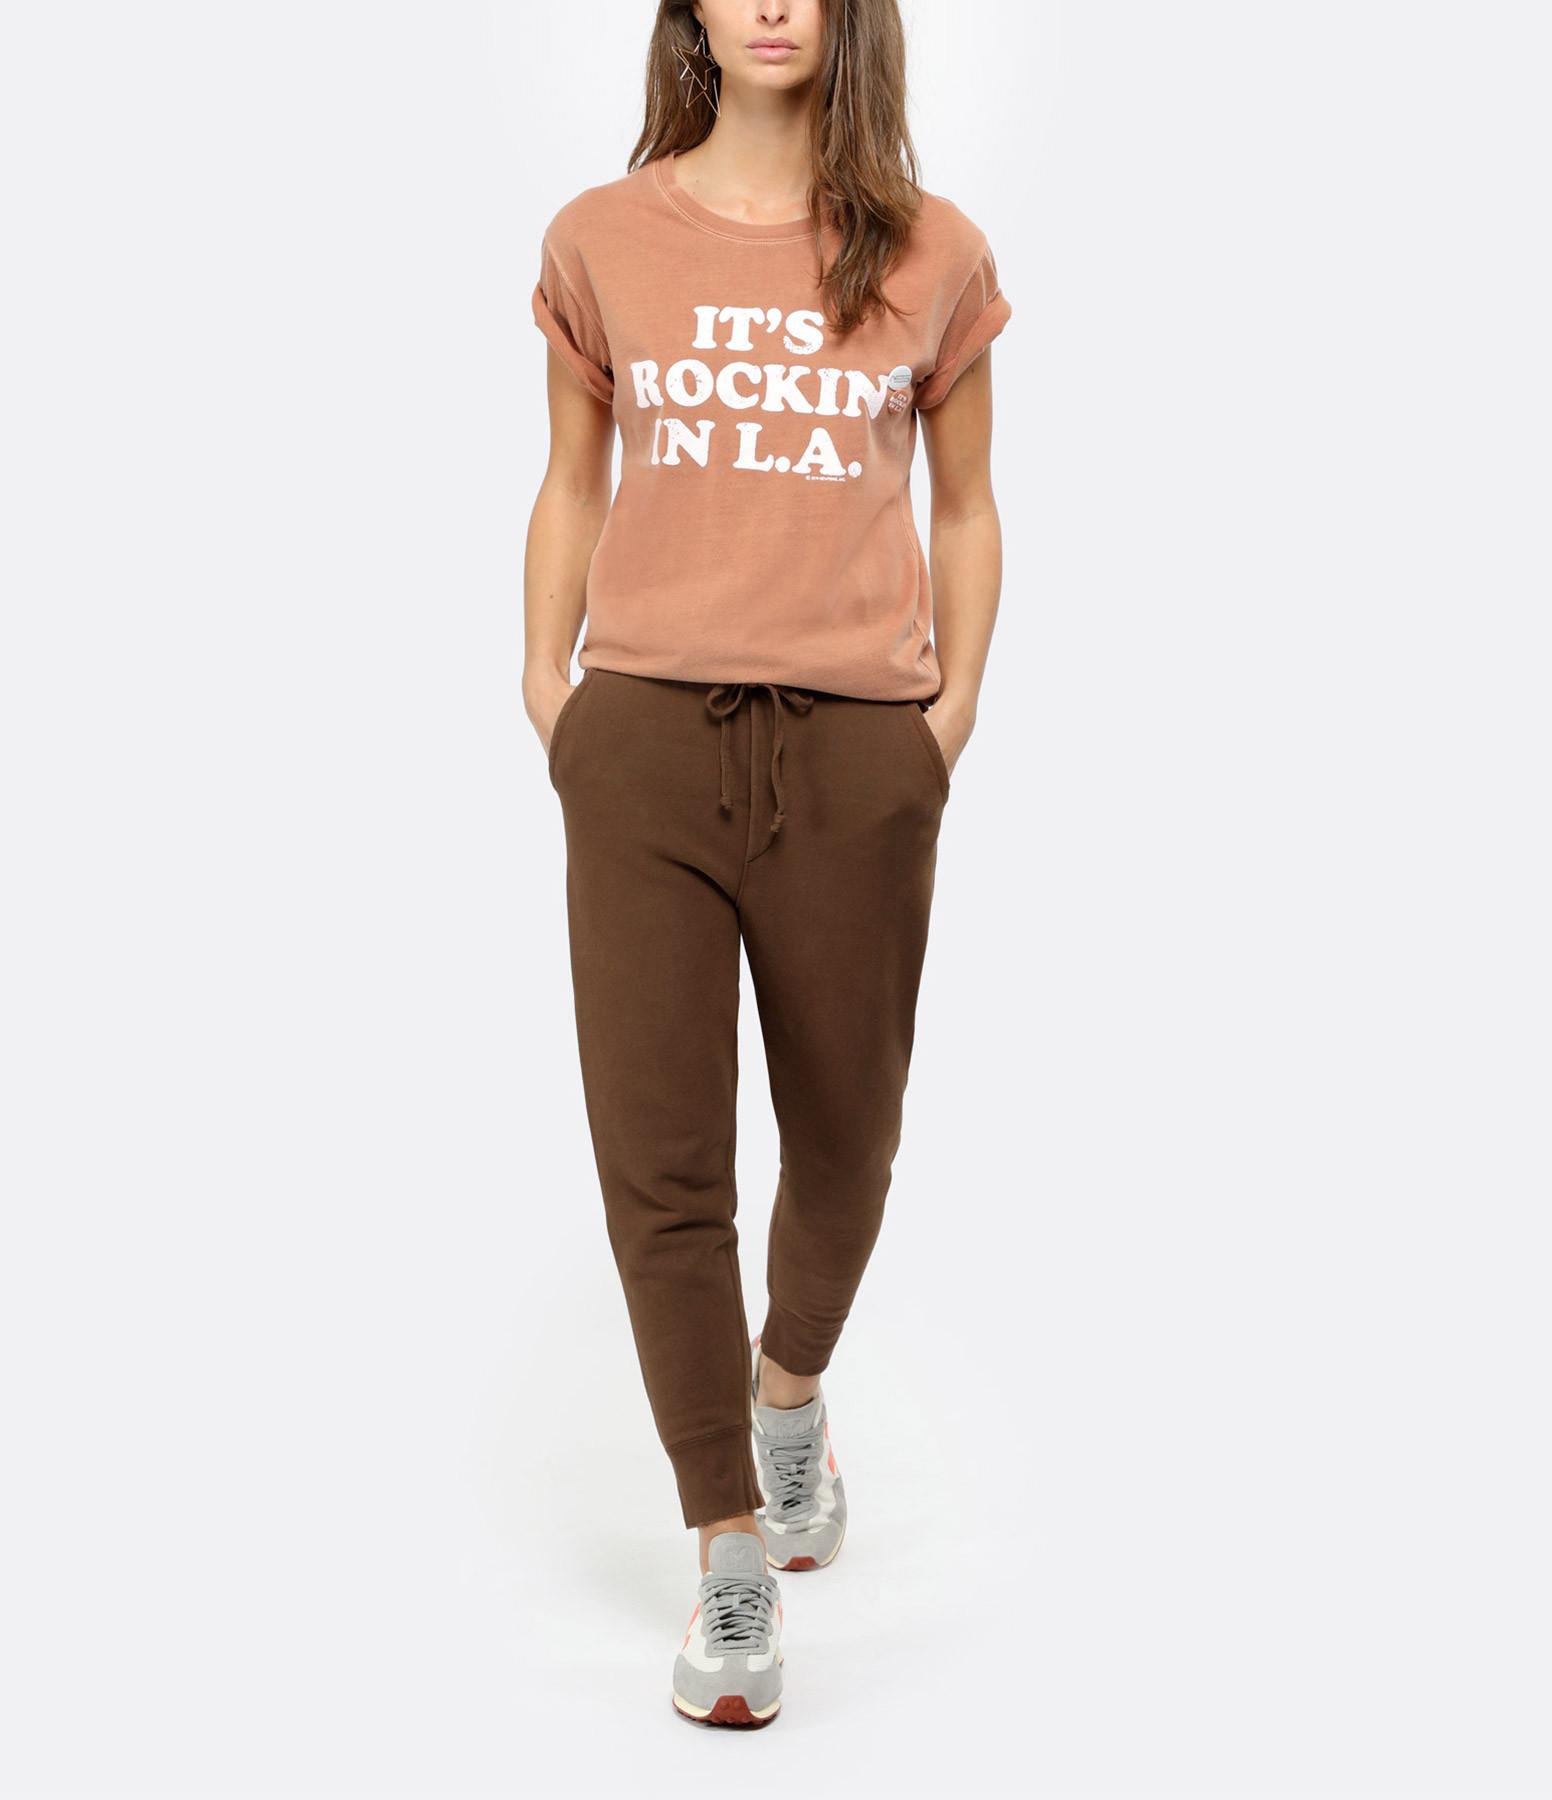 NEWTONE - Tee-shirt Rockin Fit Trucker Coton Yam